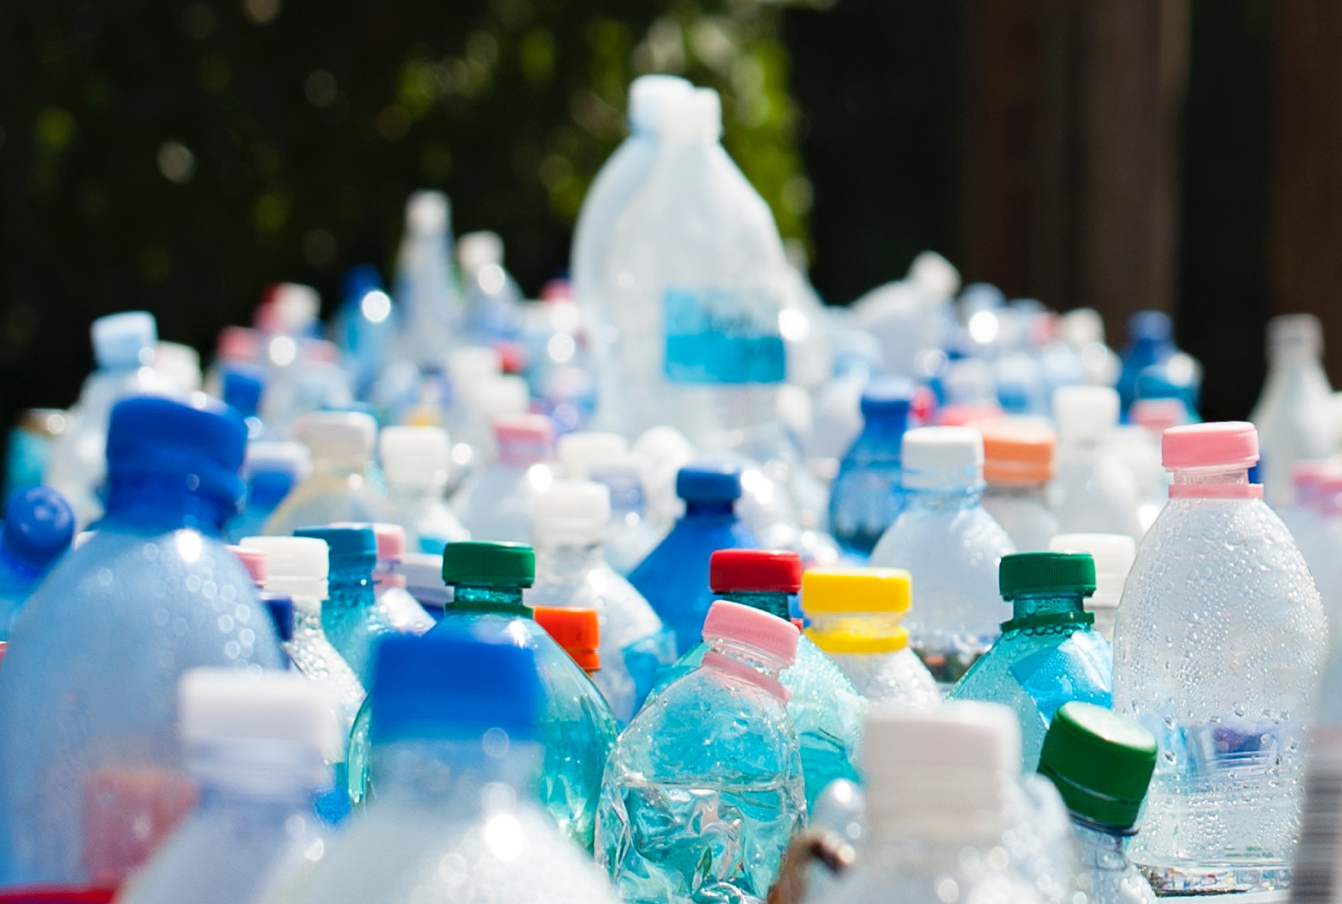 Large group of plastic bottles